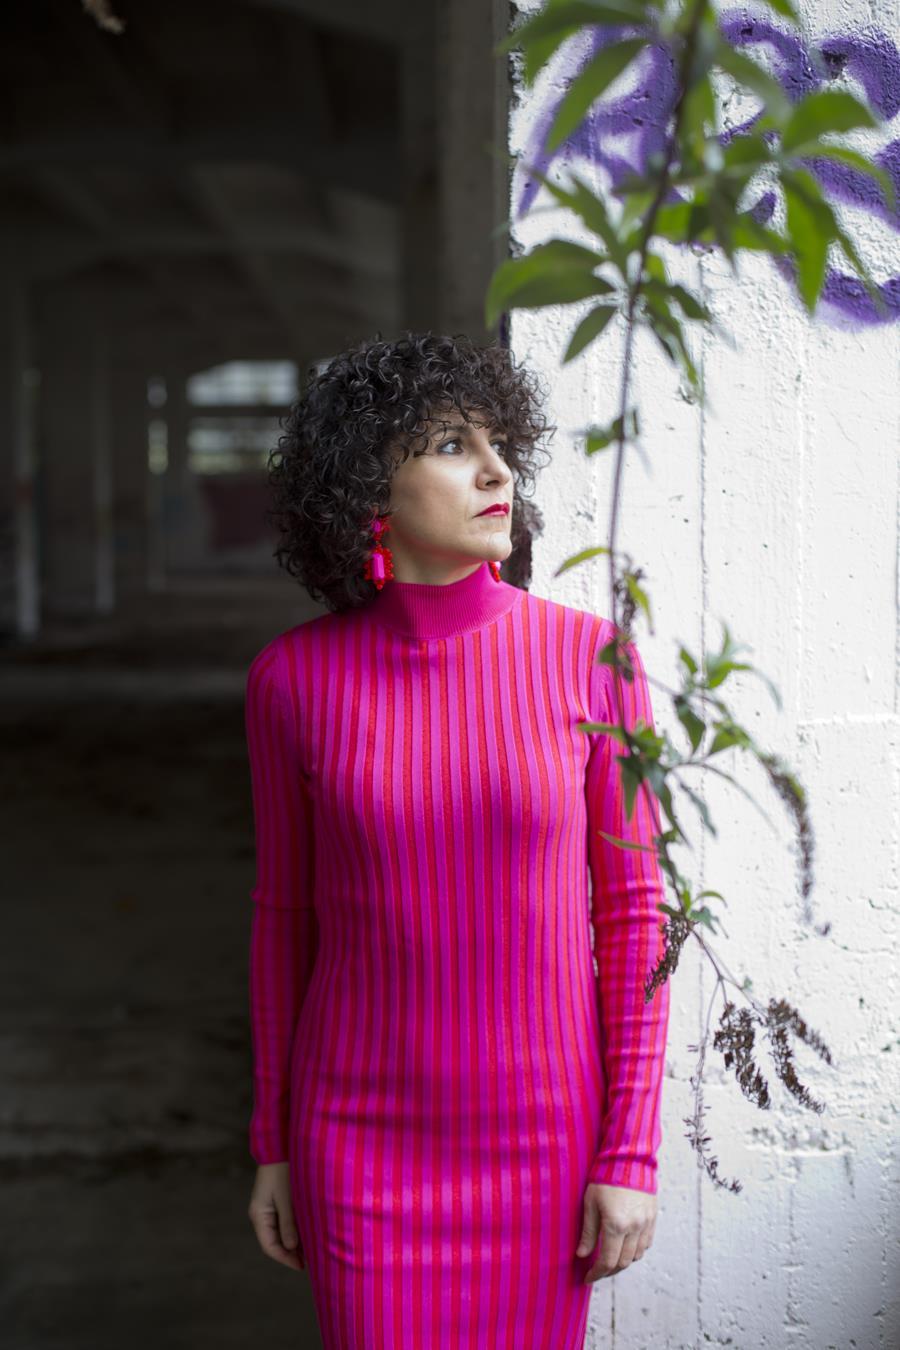 Rebeca Valdivia, asesora de imagen, personal shopper, estilista, stilist, influencer, Donostia, San Sebastián, Miss Clov, la blogger indie, influencer, dress, vestido canalé, rosa, pink, rizos, curls, tomboystyle, graffitis